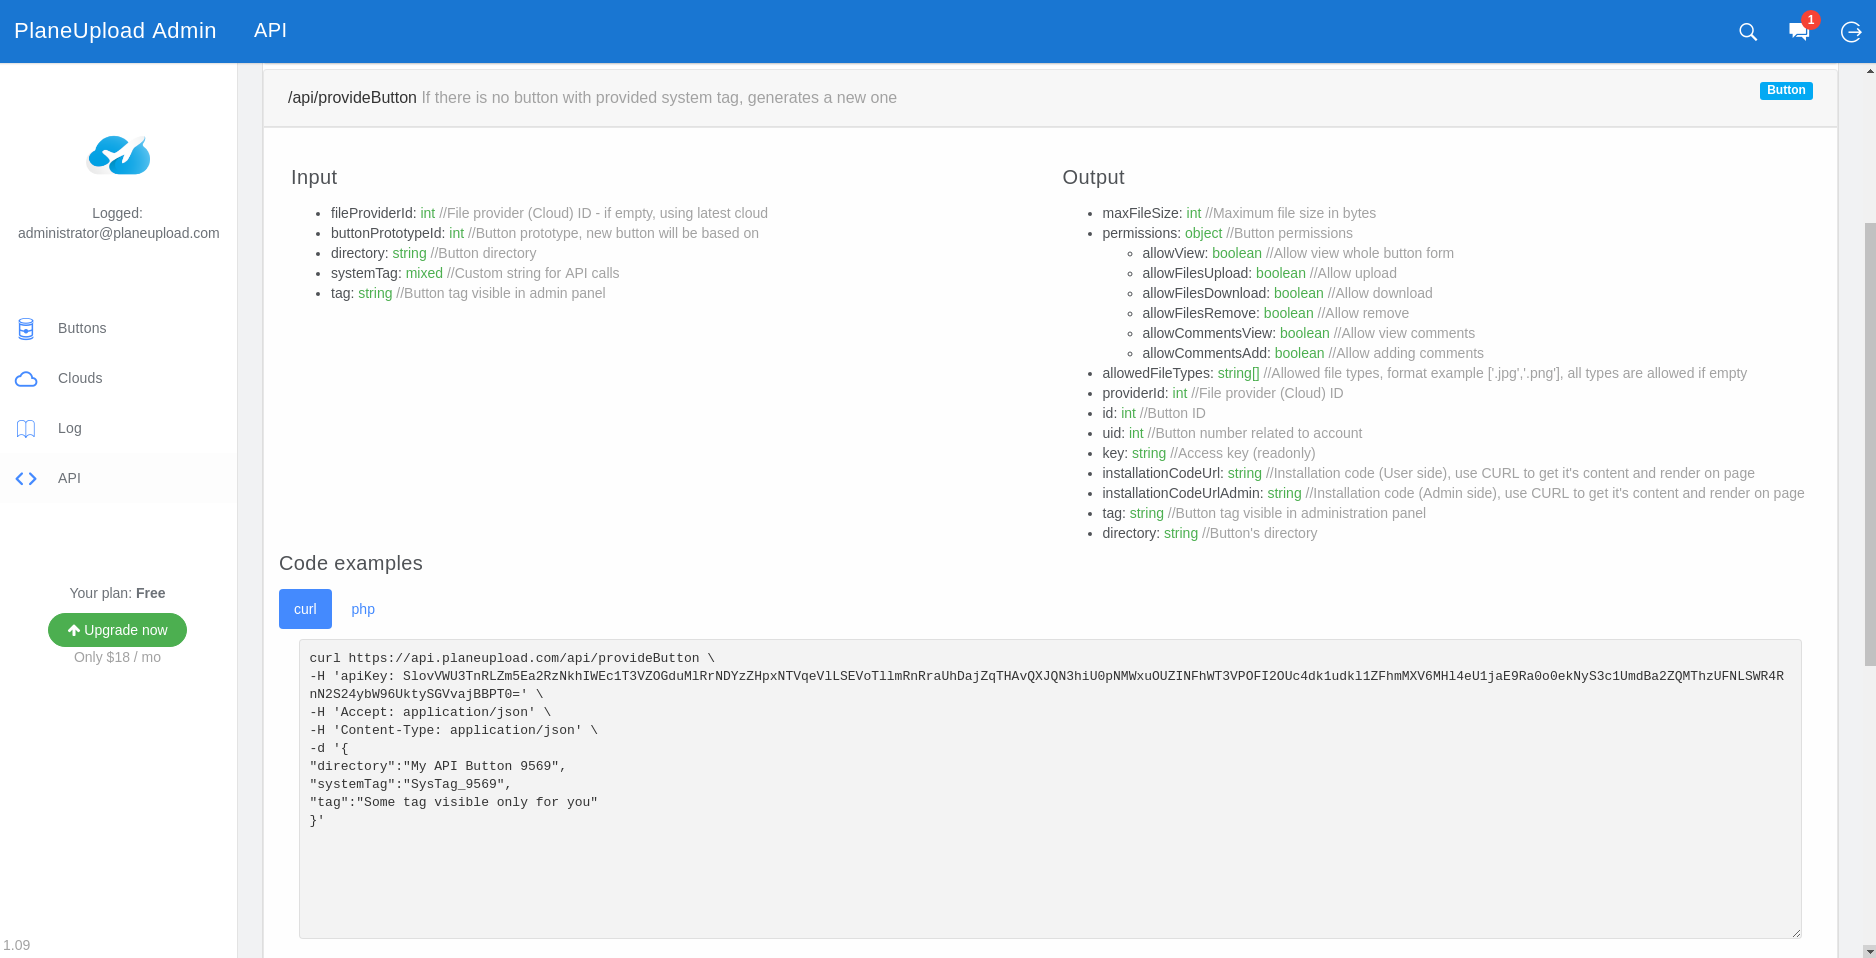 Admin Panel - API